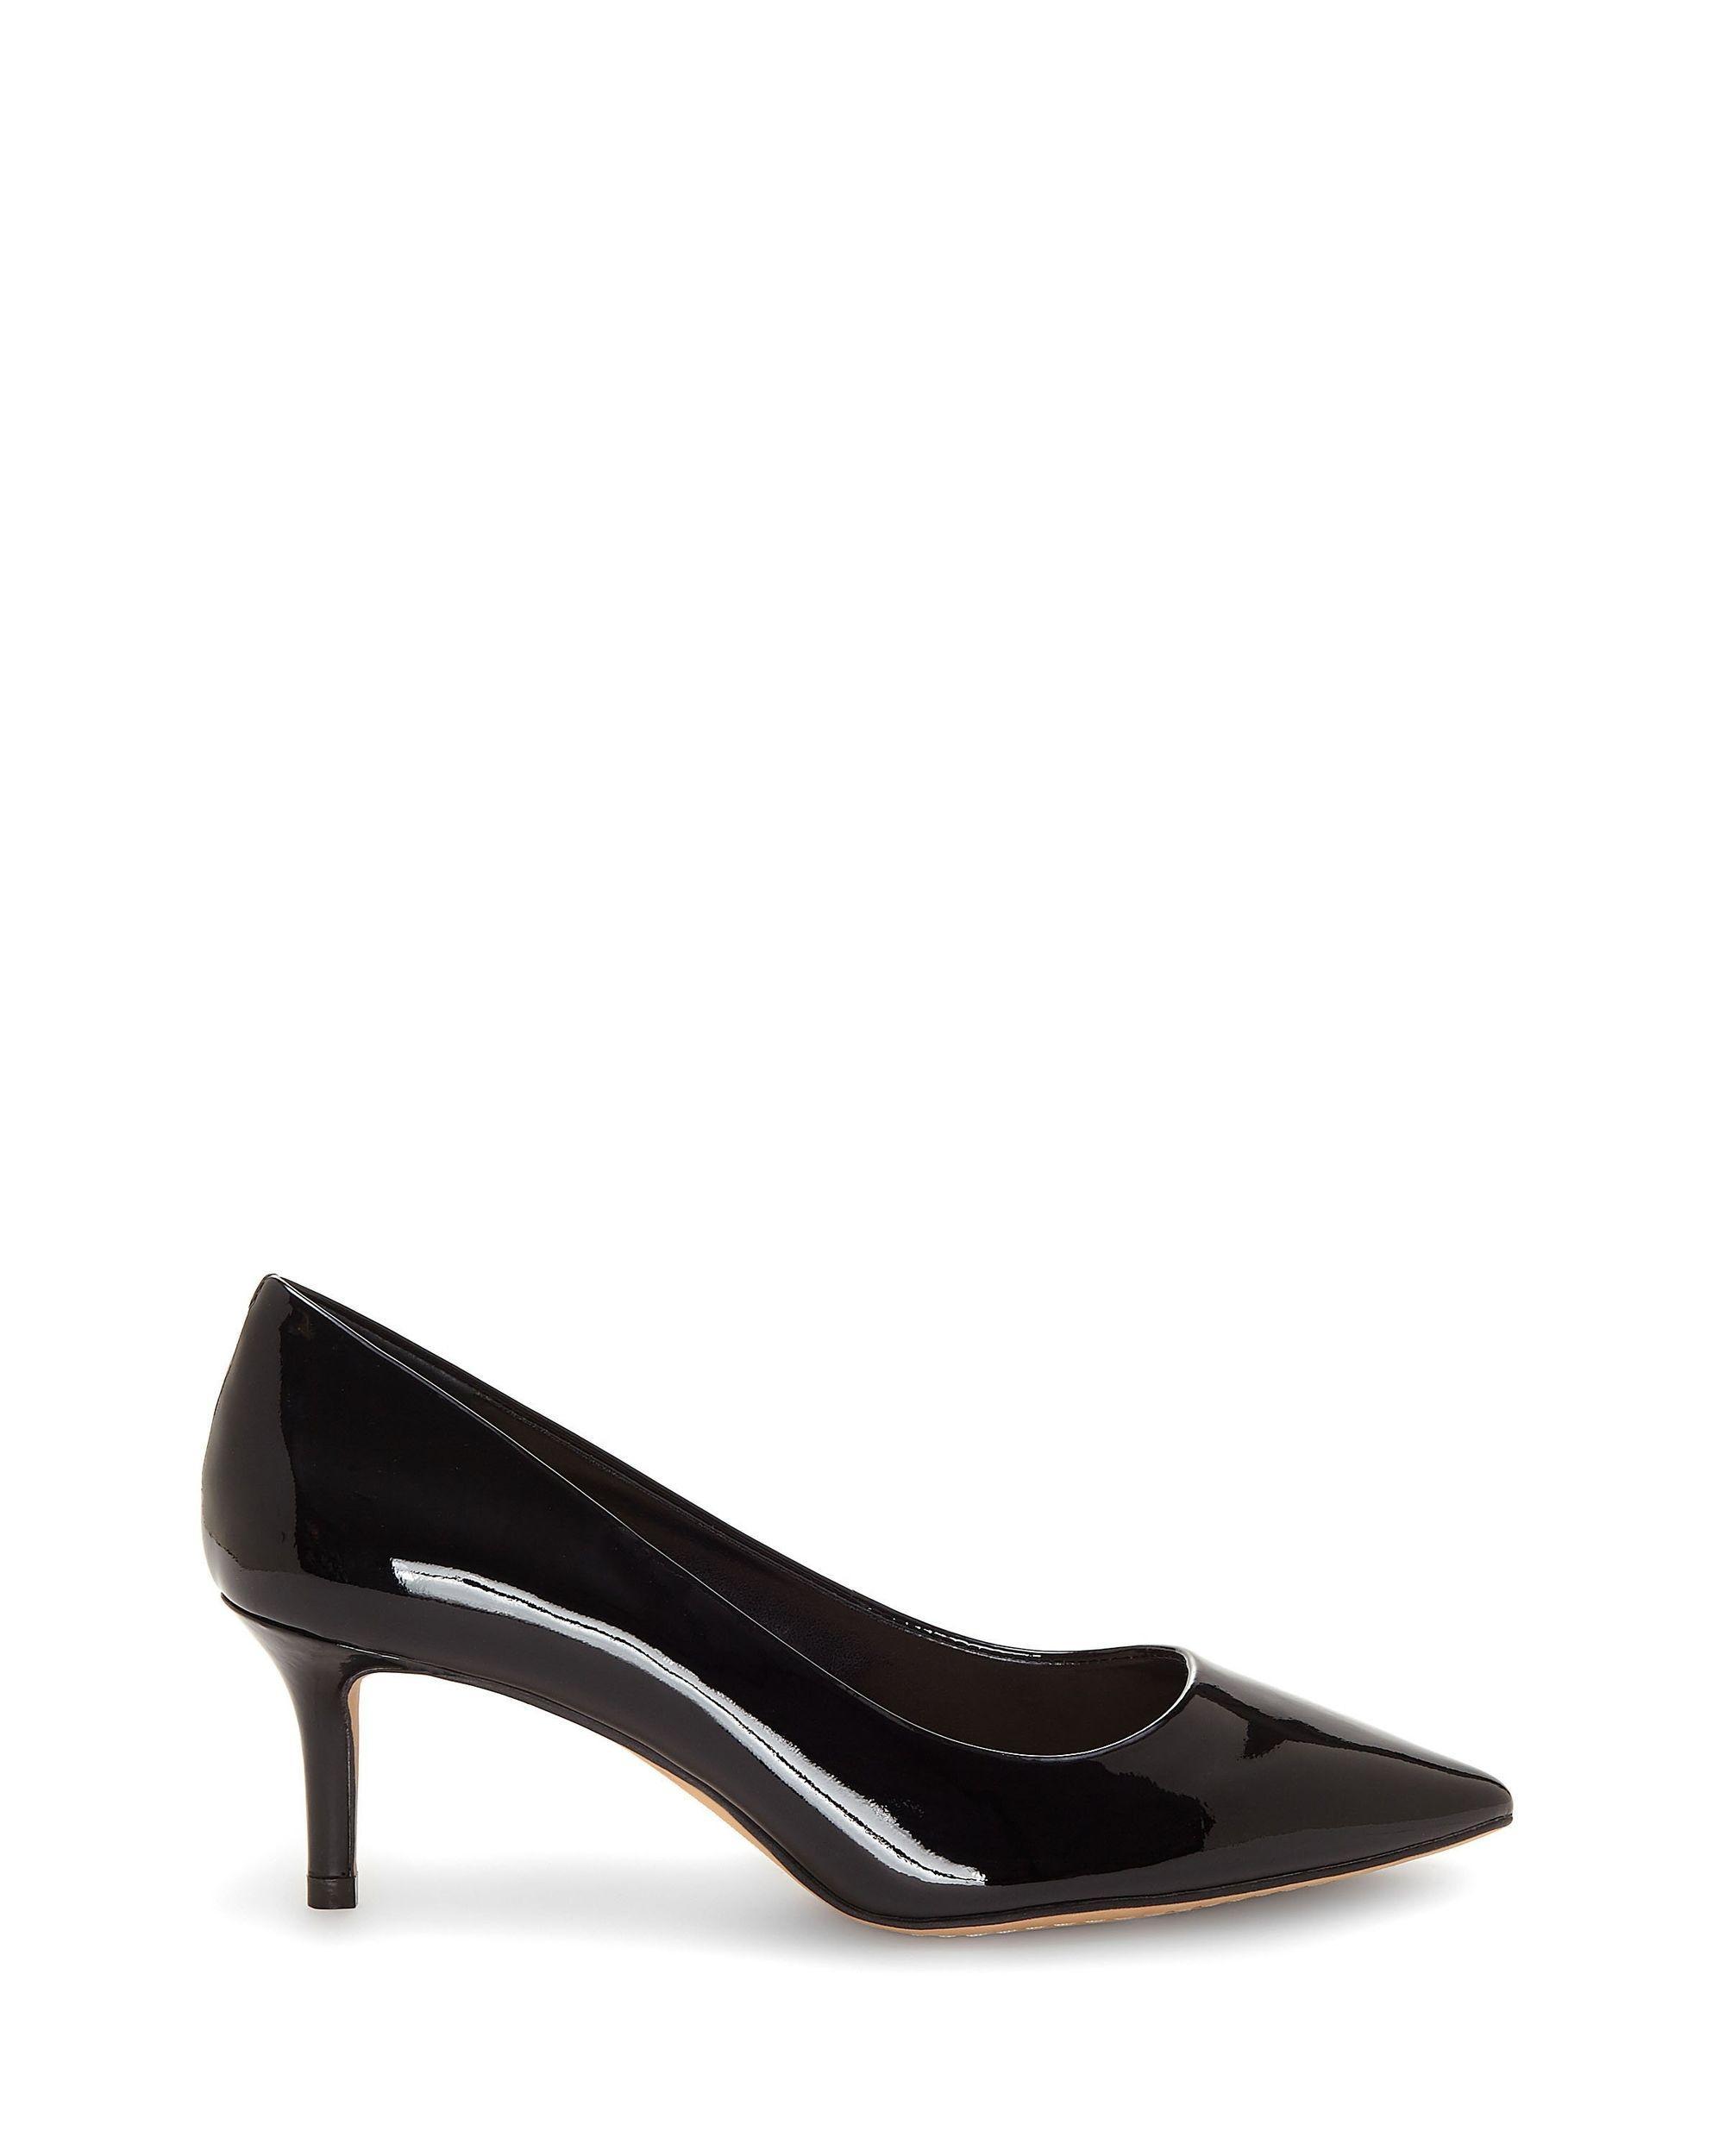 242808660af9 Lyst - Vince Camuto Kemira – Low-heel Pump in Black